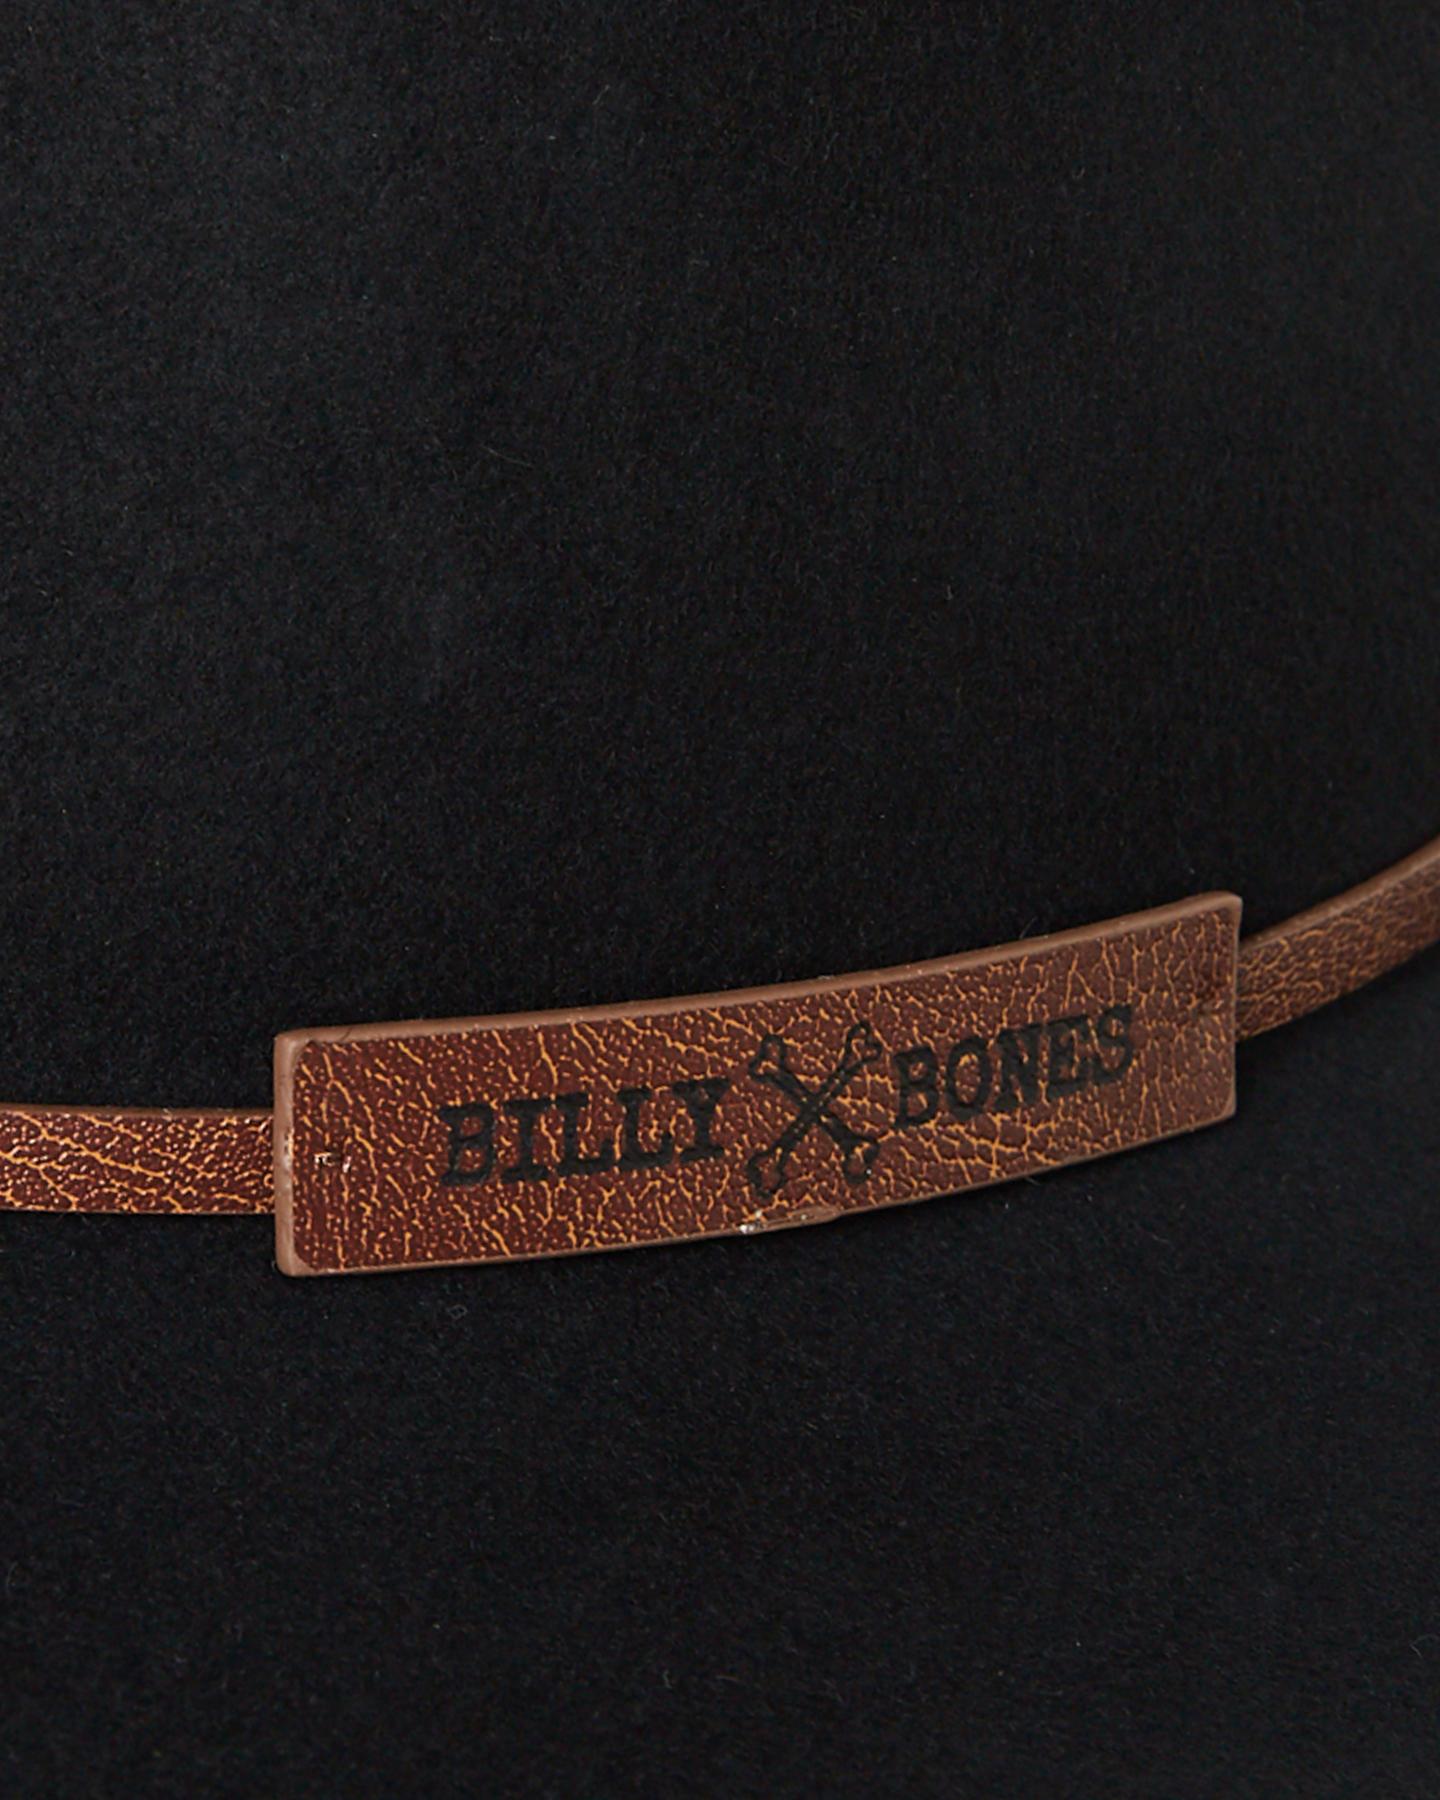 b7b455d199cd5 ... BLACK MENS ACCESSORIES BILLY BONES CLUB HEADWEAR - BBCFED010BLK